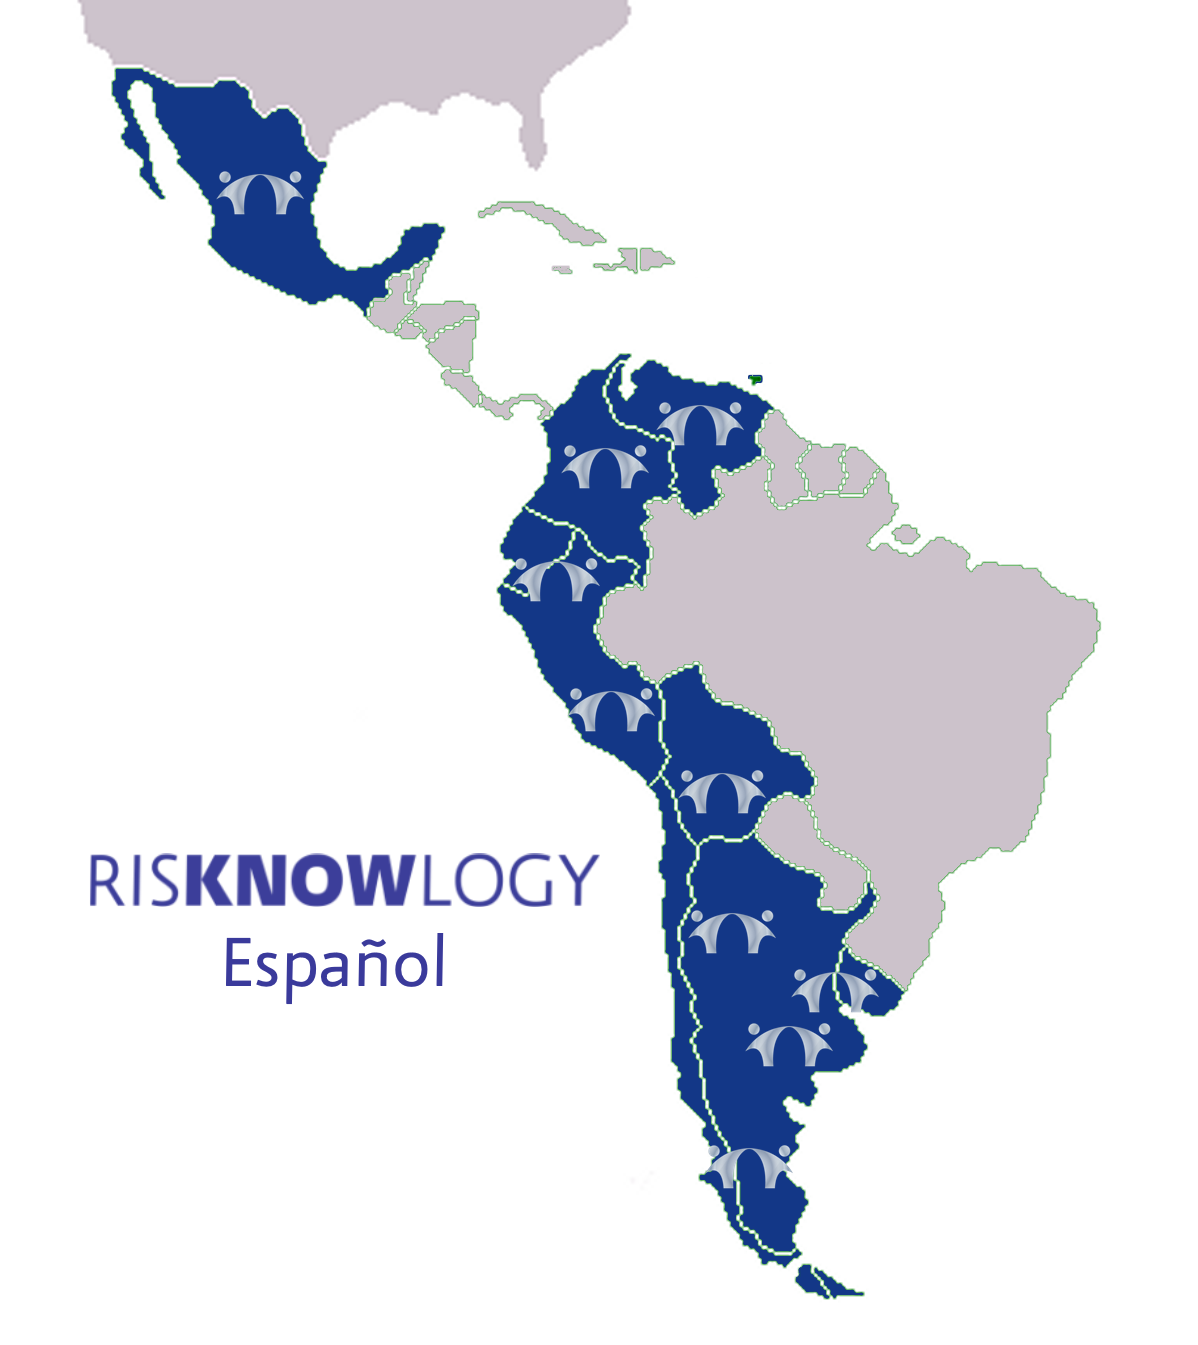 image of Risknowlogy Español en Latinoamérica